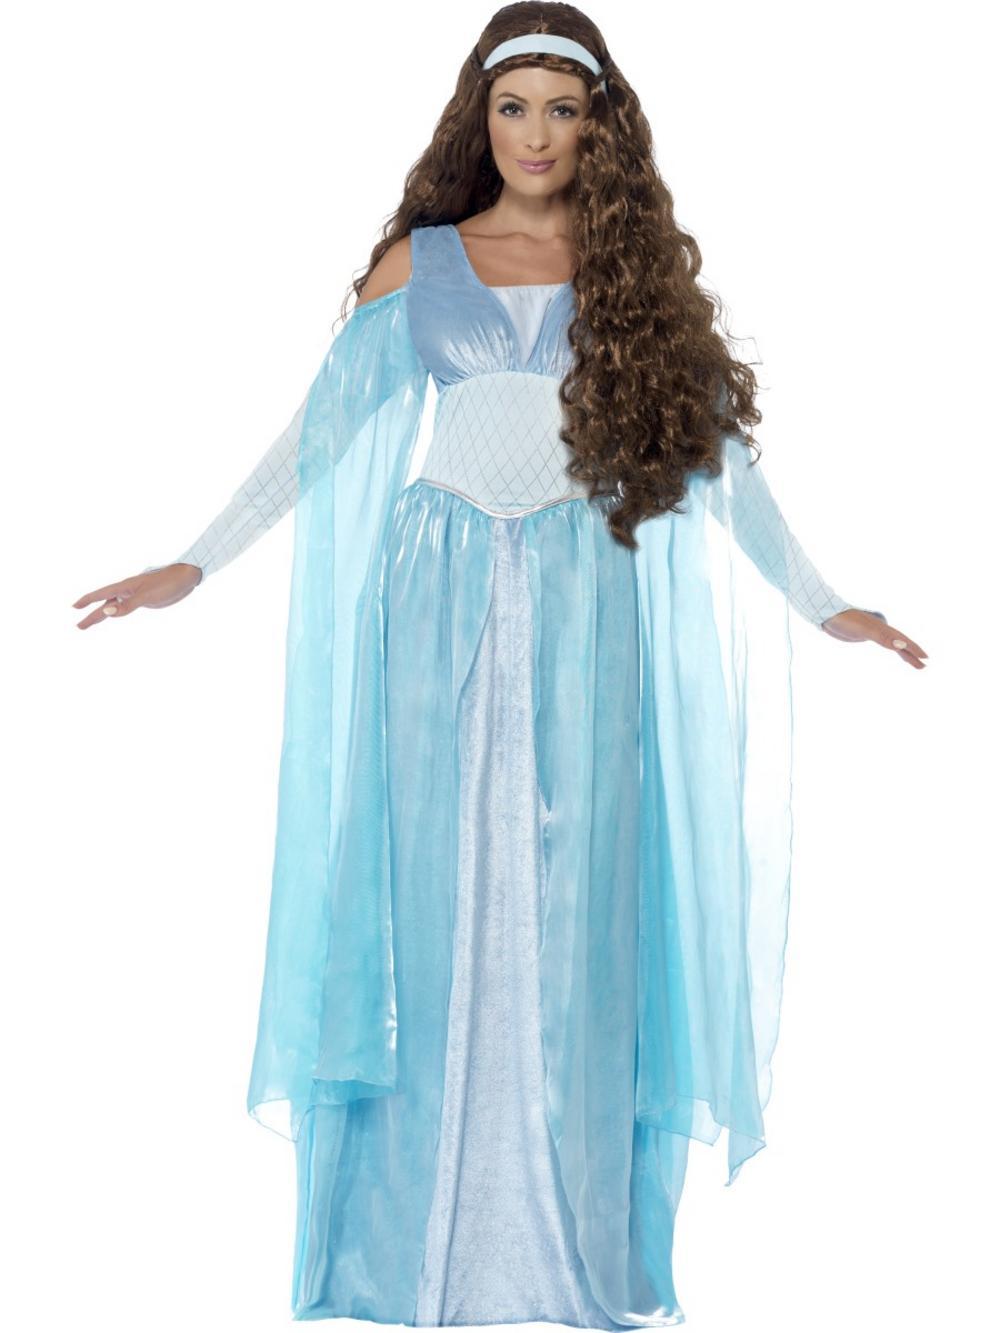 Medieval Maiden Deluxe Costume